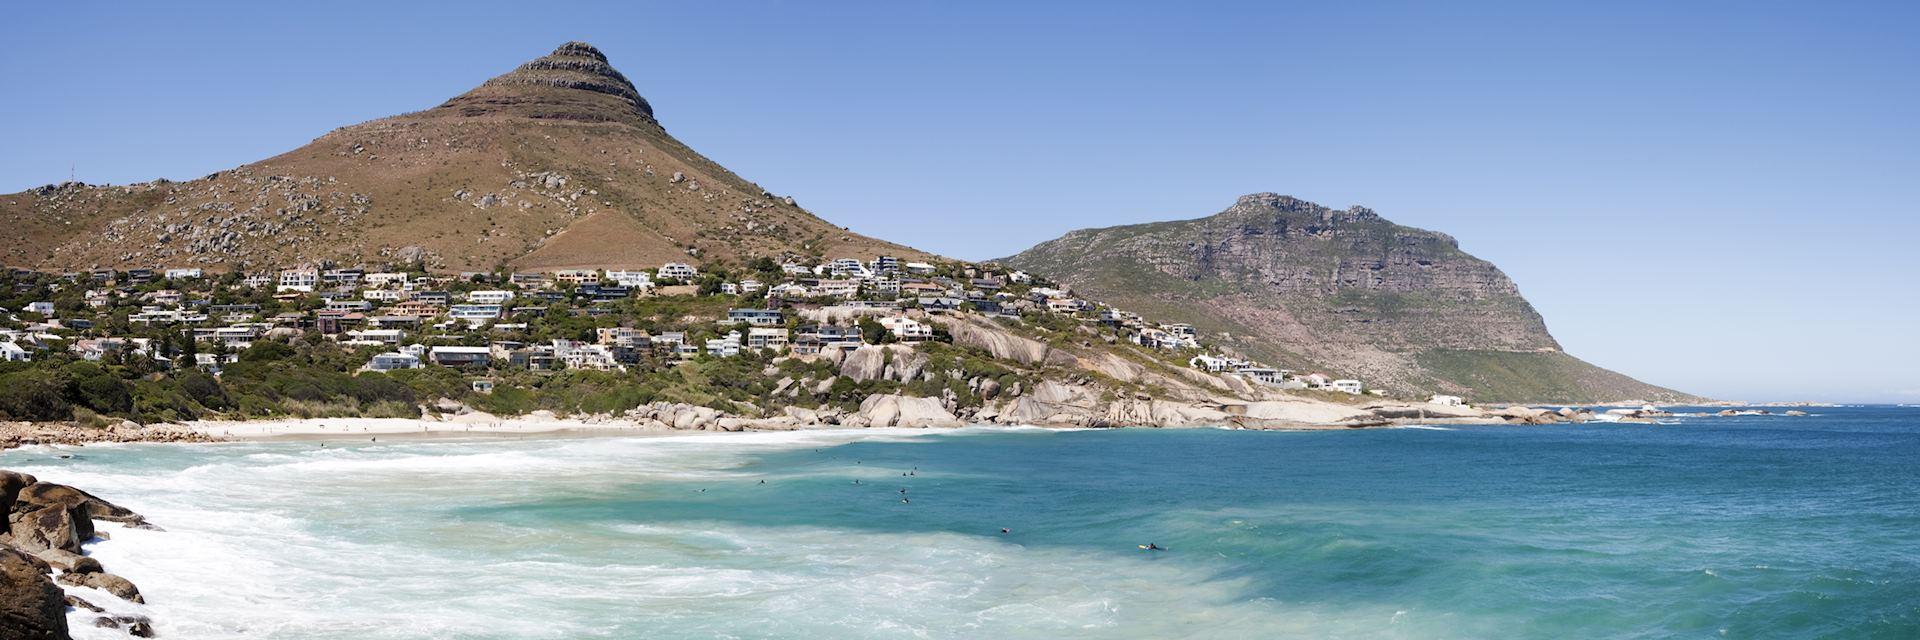 Llandudno, a suburb of Cape Town